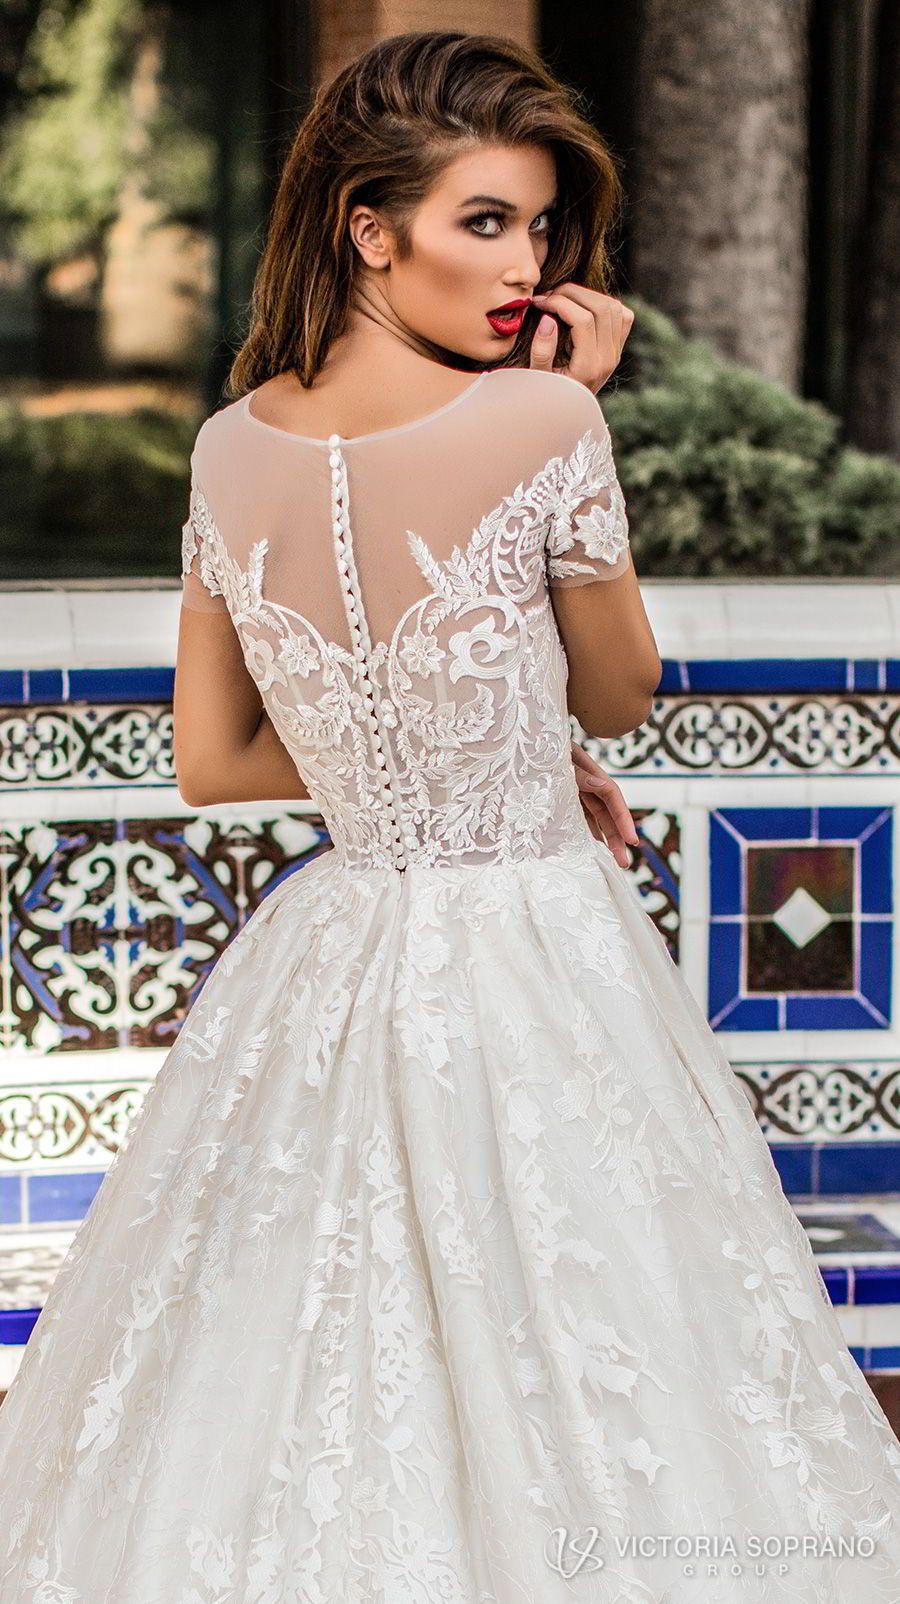 Victoria Soprano 2018 Wedding Dresses The One Bridal Collection Wedding Inspirasi Wedding Dresses Short Wedding Dress Wedding Dress Inspiration [ 1604 x 900 Pixel ]